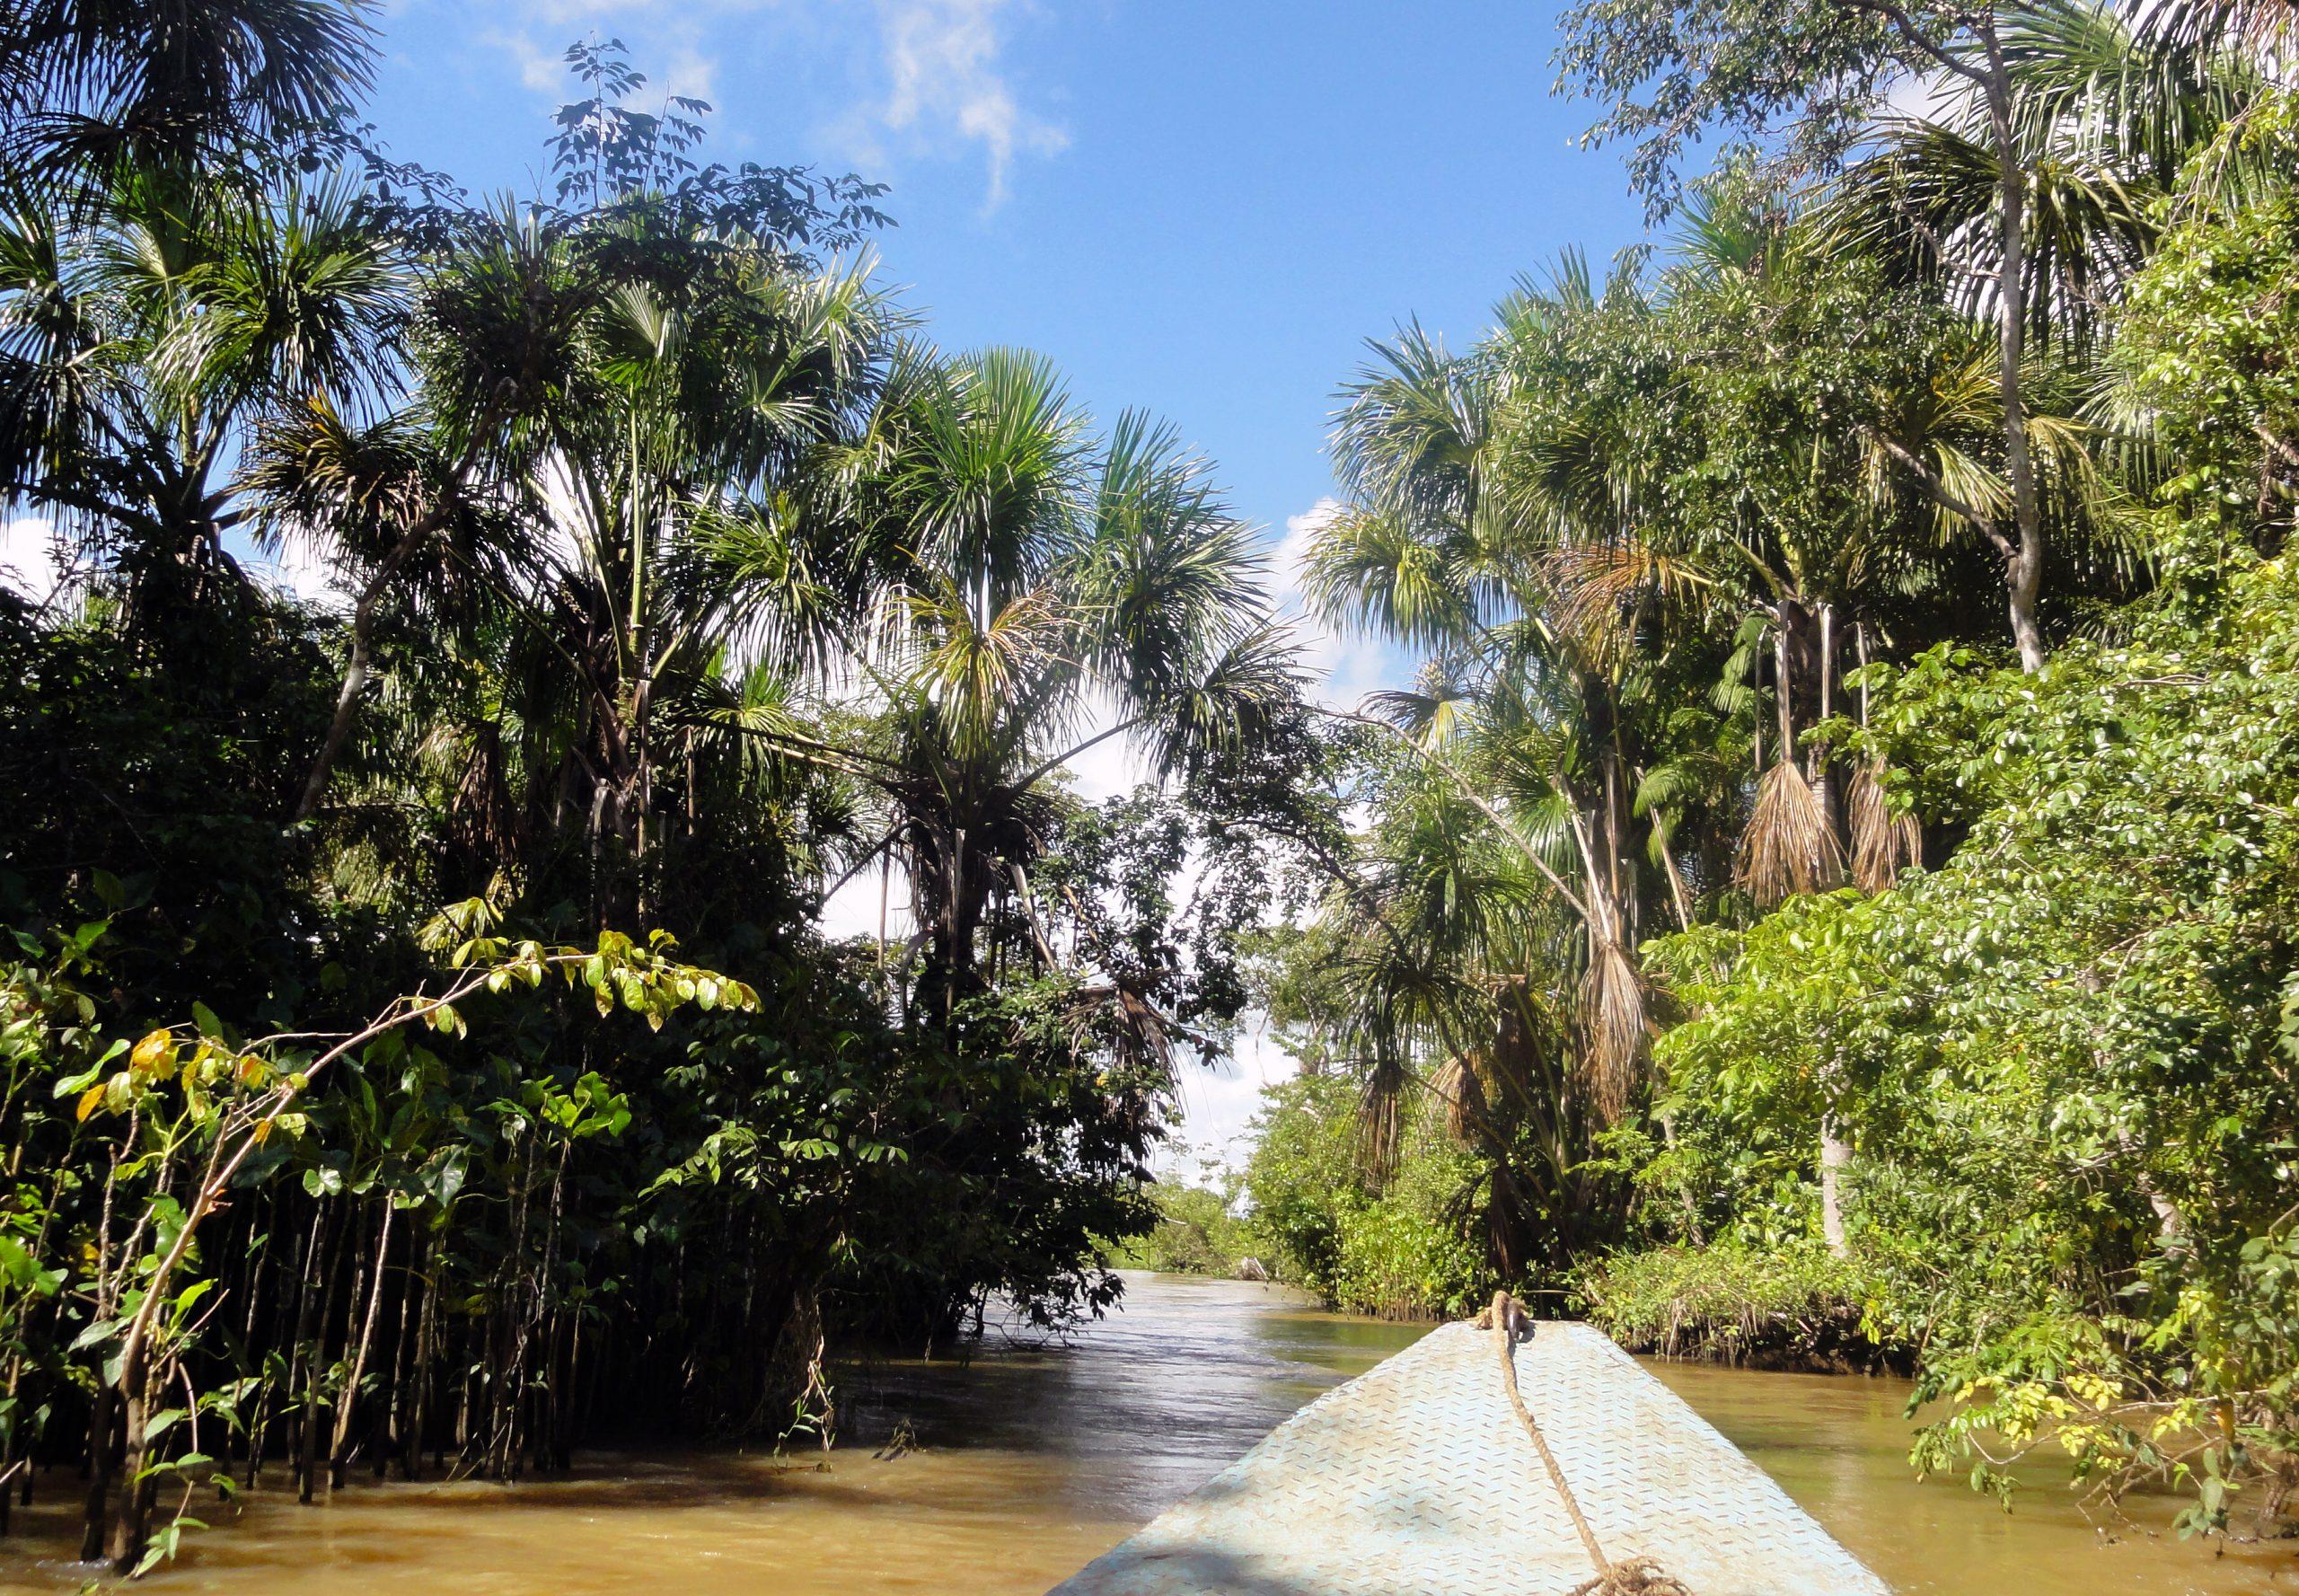 Cjb - Chercheurs avec Serre De Jardin Amazon